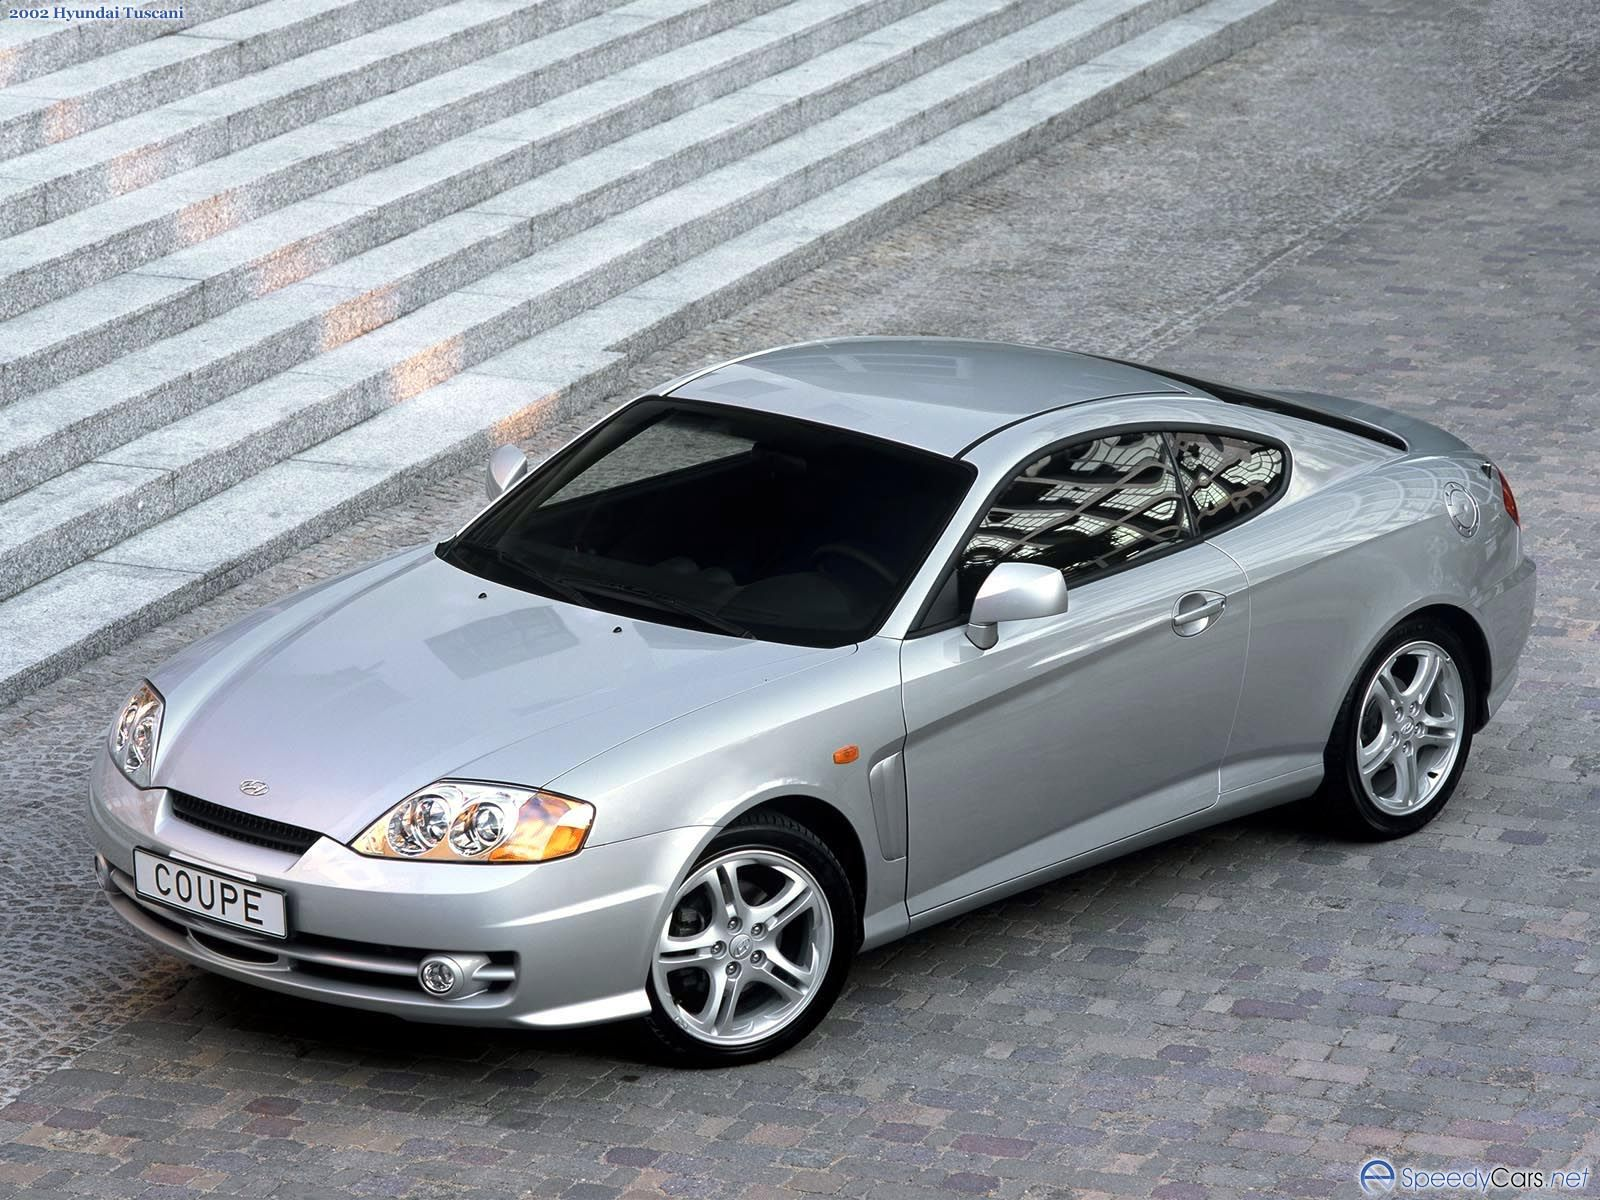 Hyundai Tuscani Photos Photogallery With 8 Pics